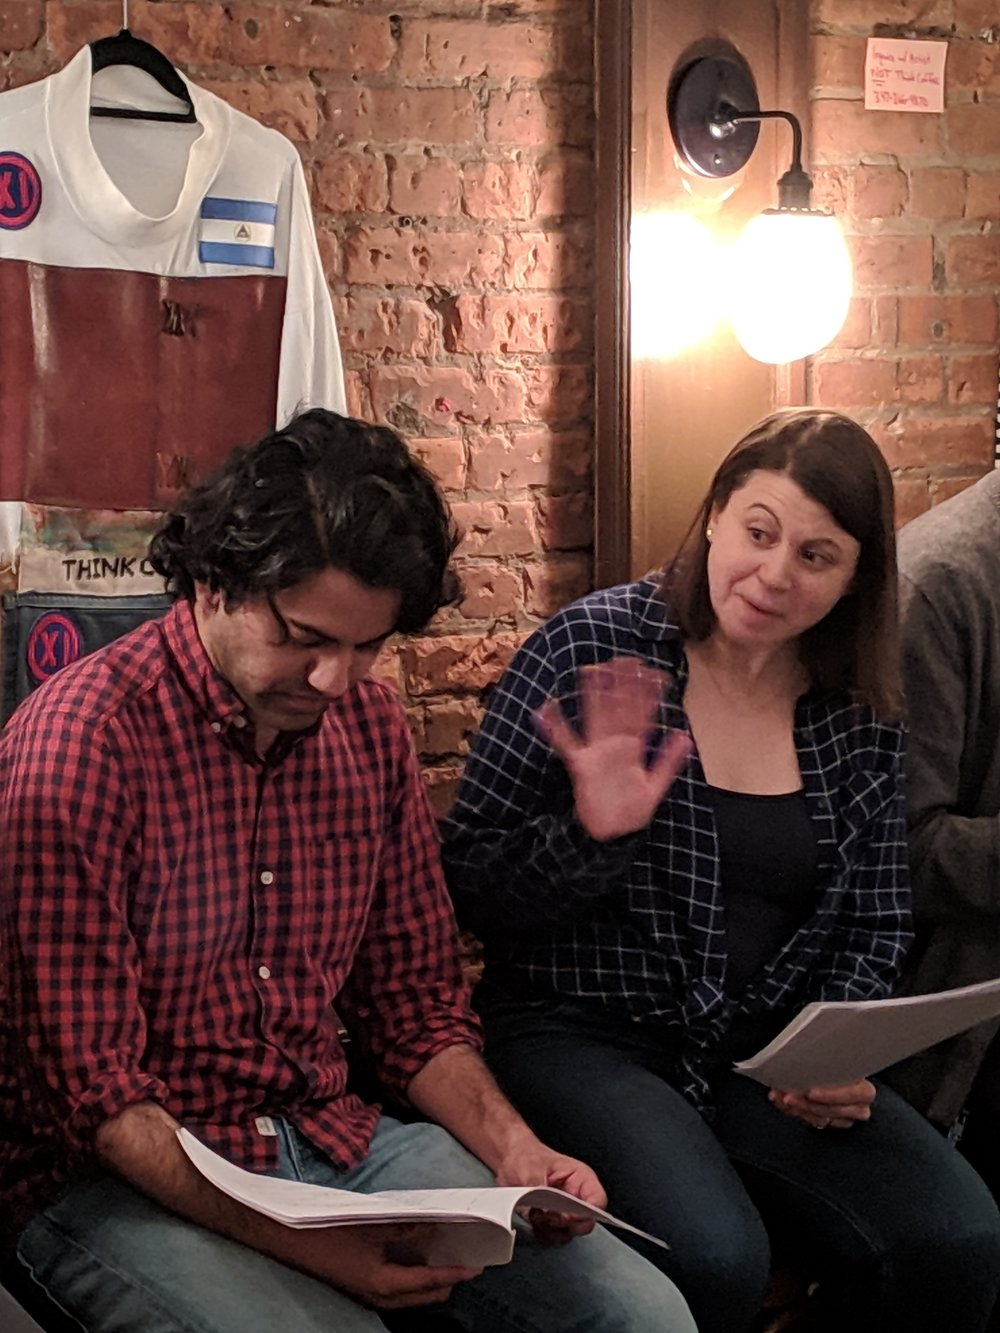 Domesticated Animals by Jona Tarlin  With: Imran Sheikh, Natalie Neckyfarow and Kyle Minshew (not pictured)